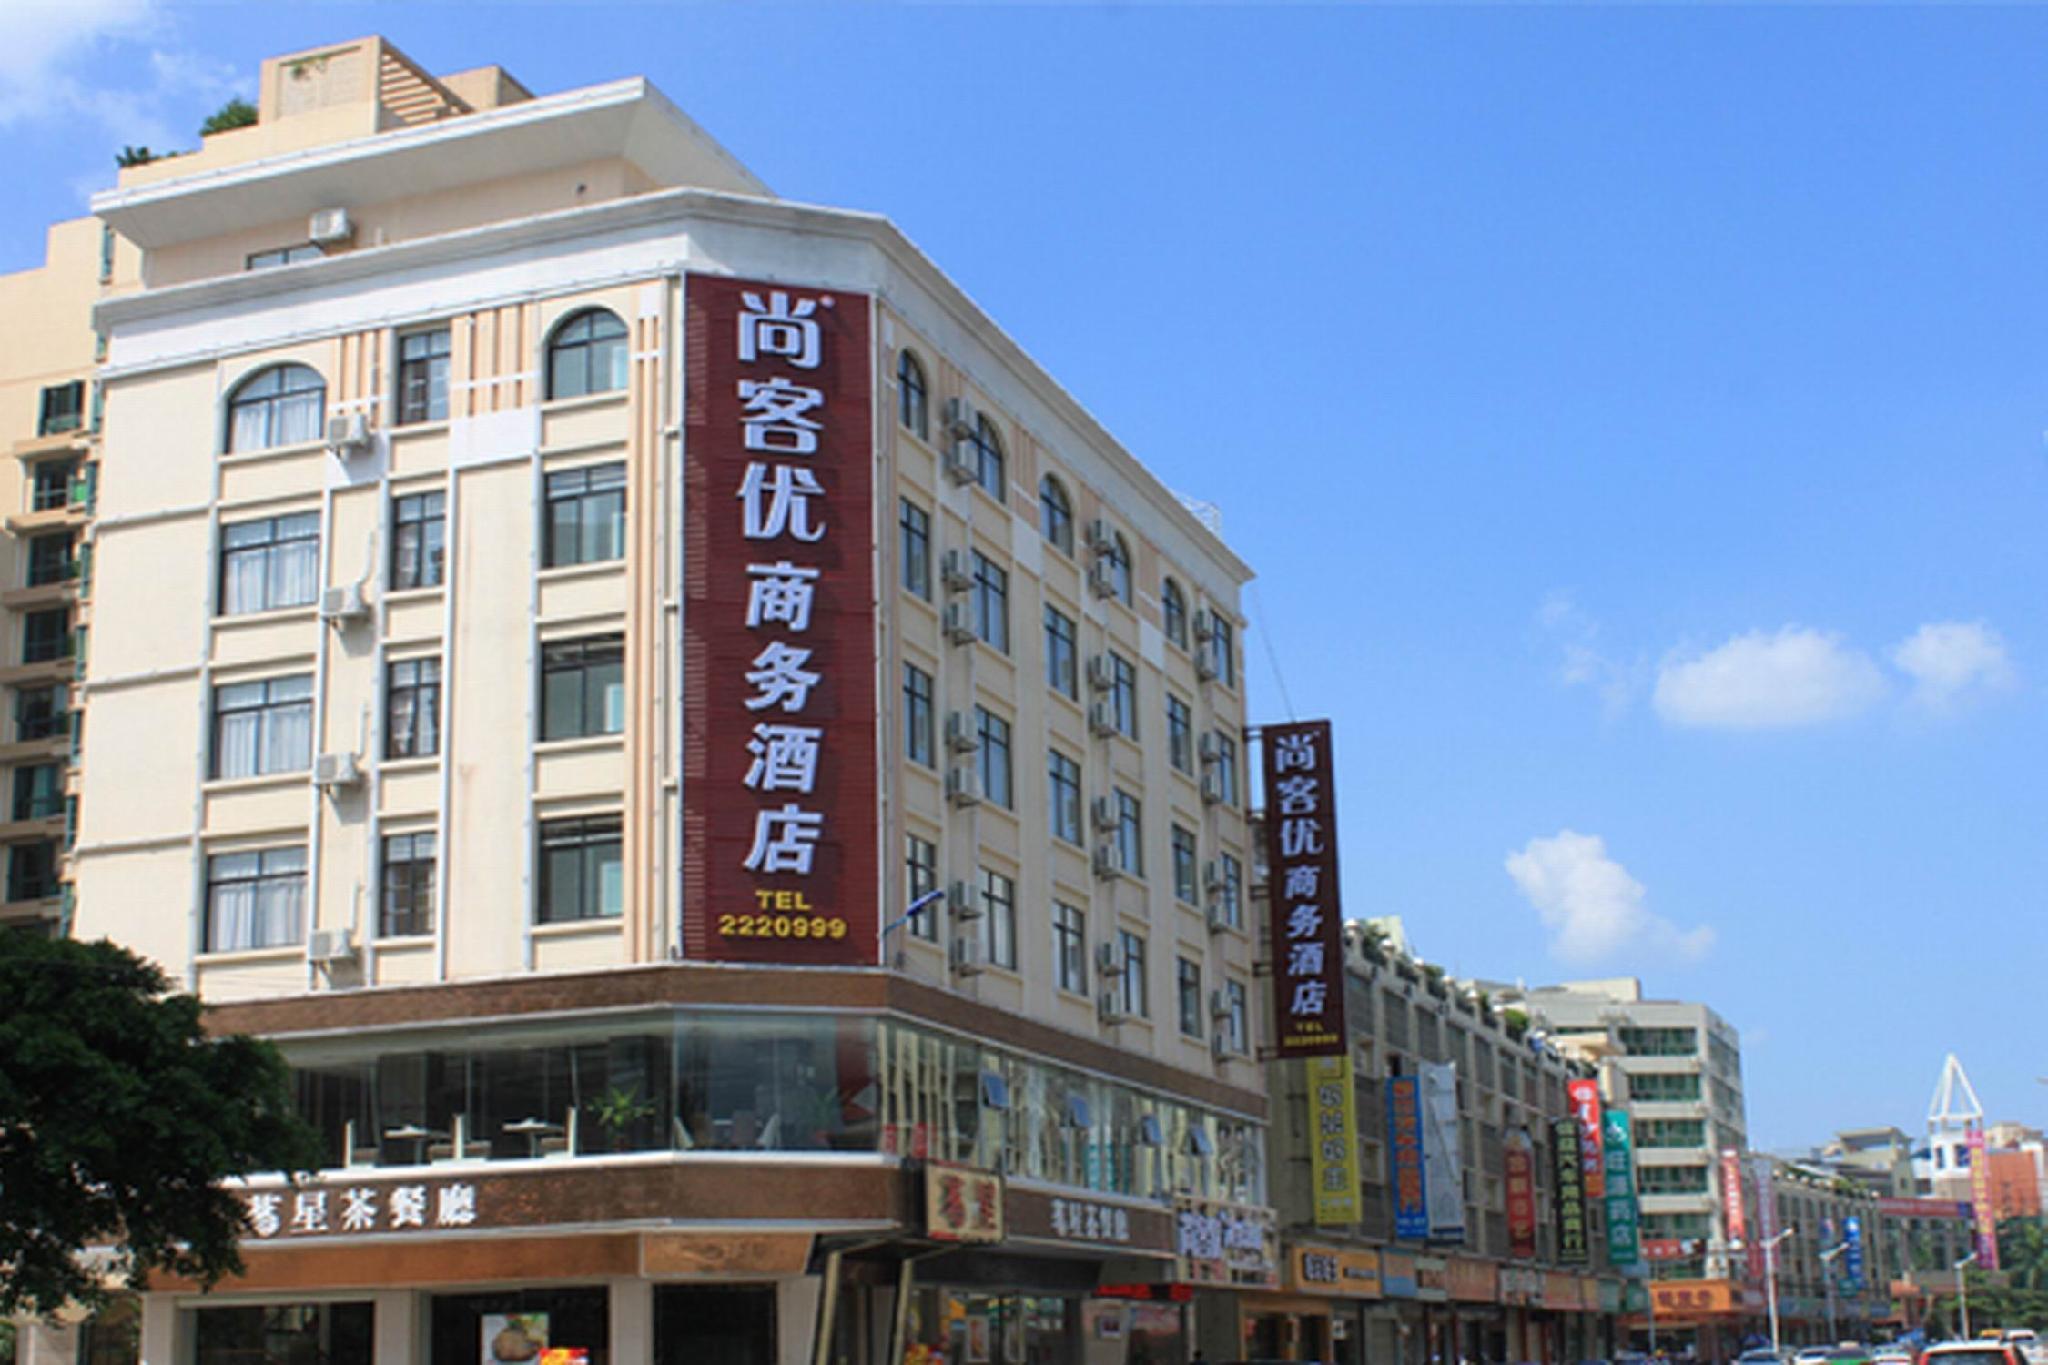 Thank Inn Plus Hotel Heyuan City New District Wangyuan Road